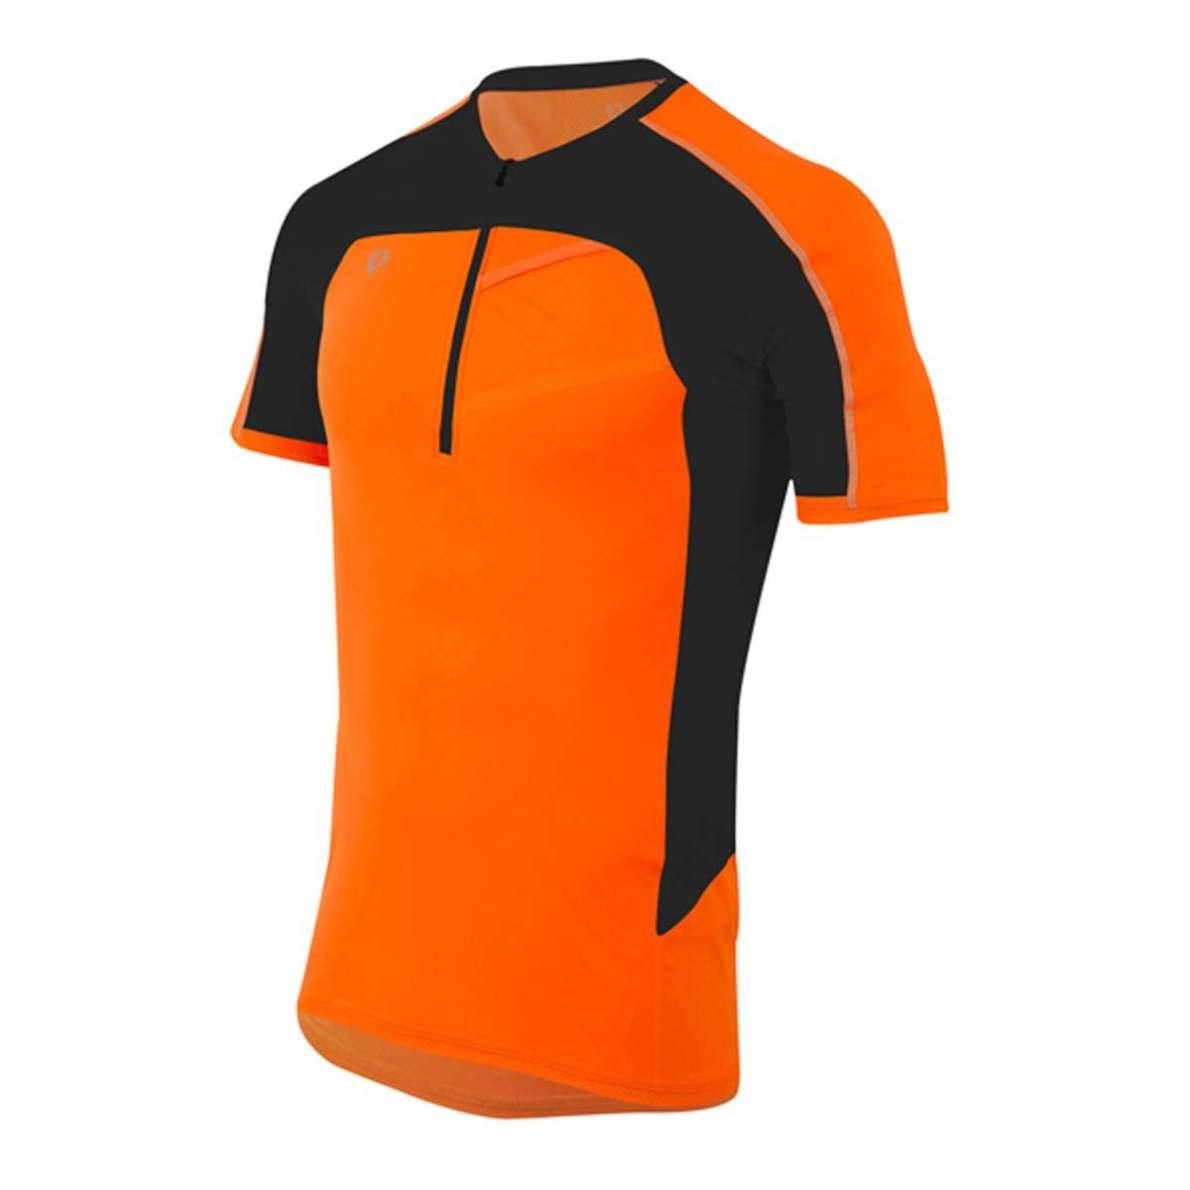 PEARL iZUMi PURSUIT ENDURANCE SS triko, screaming oranžová/černá, L